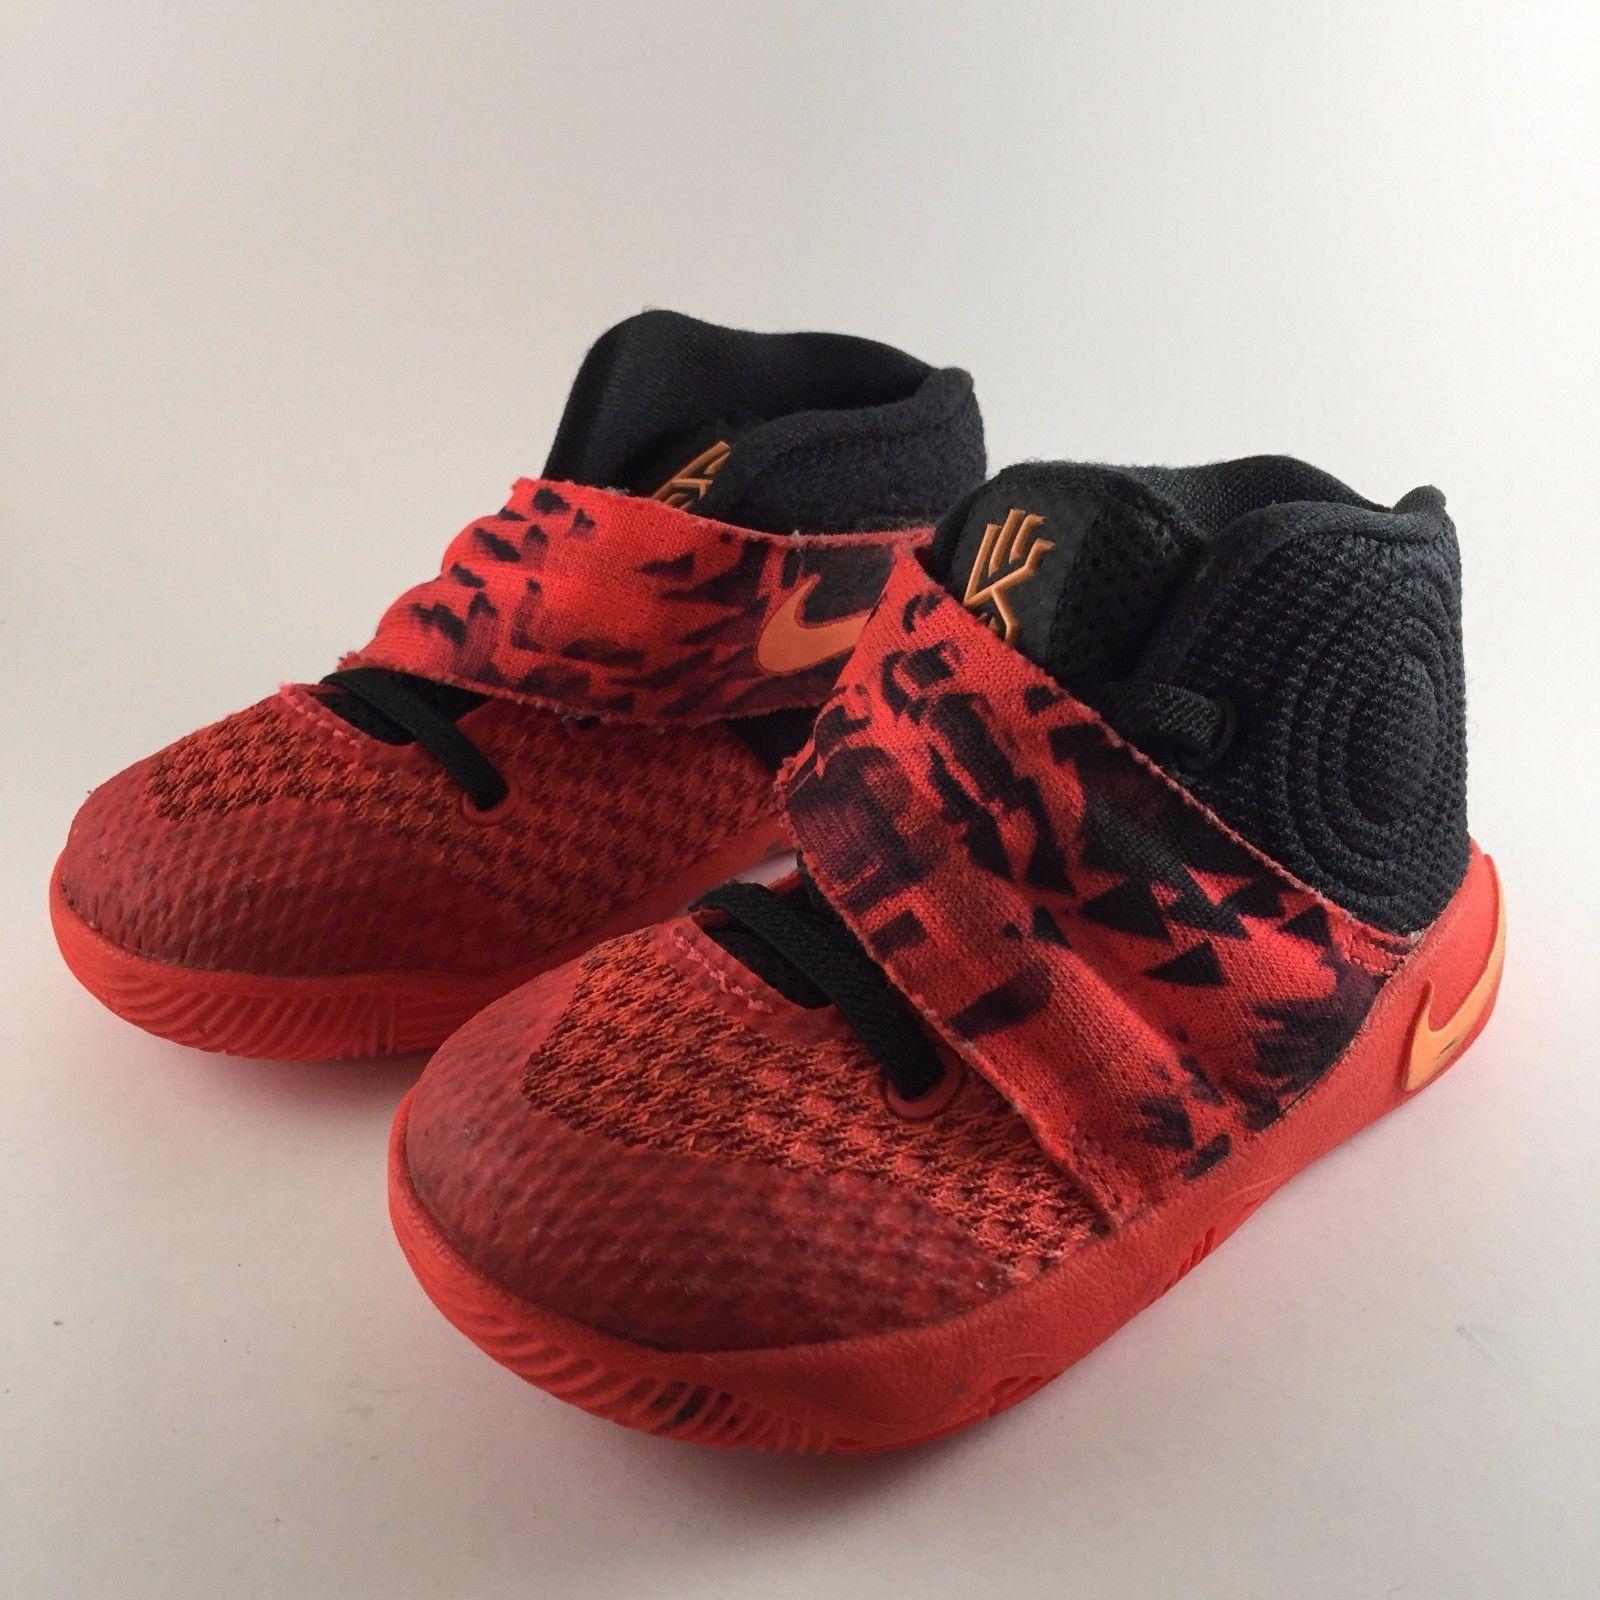 97015dd8cf9 Nike Kyrie 2 (TD) Bright Crimson Atomic and similar items. 57